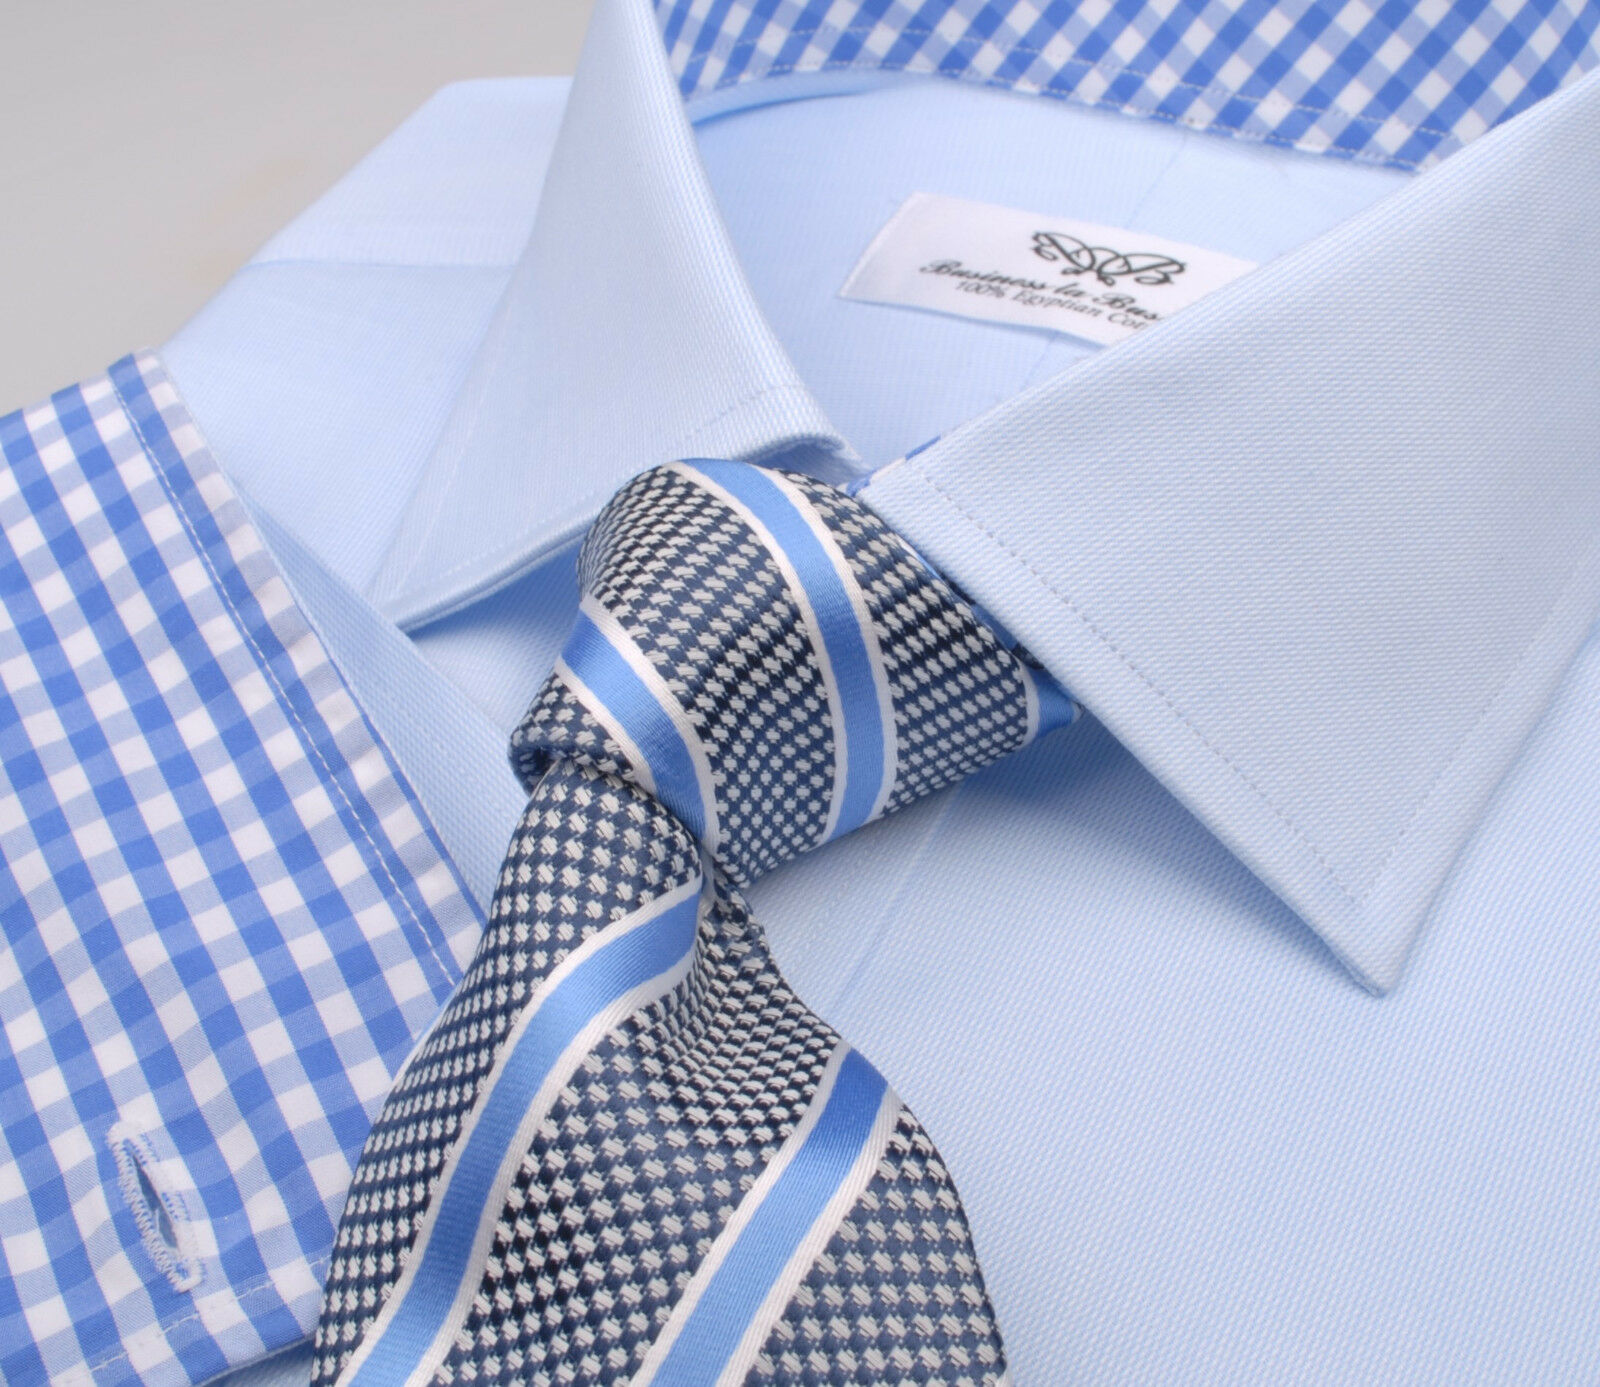 Blau Royal Oxford Dress Shirt Formal Geschäft Sexy Stylish Luxury Boss Fashion